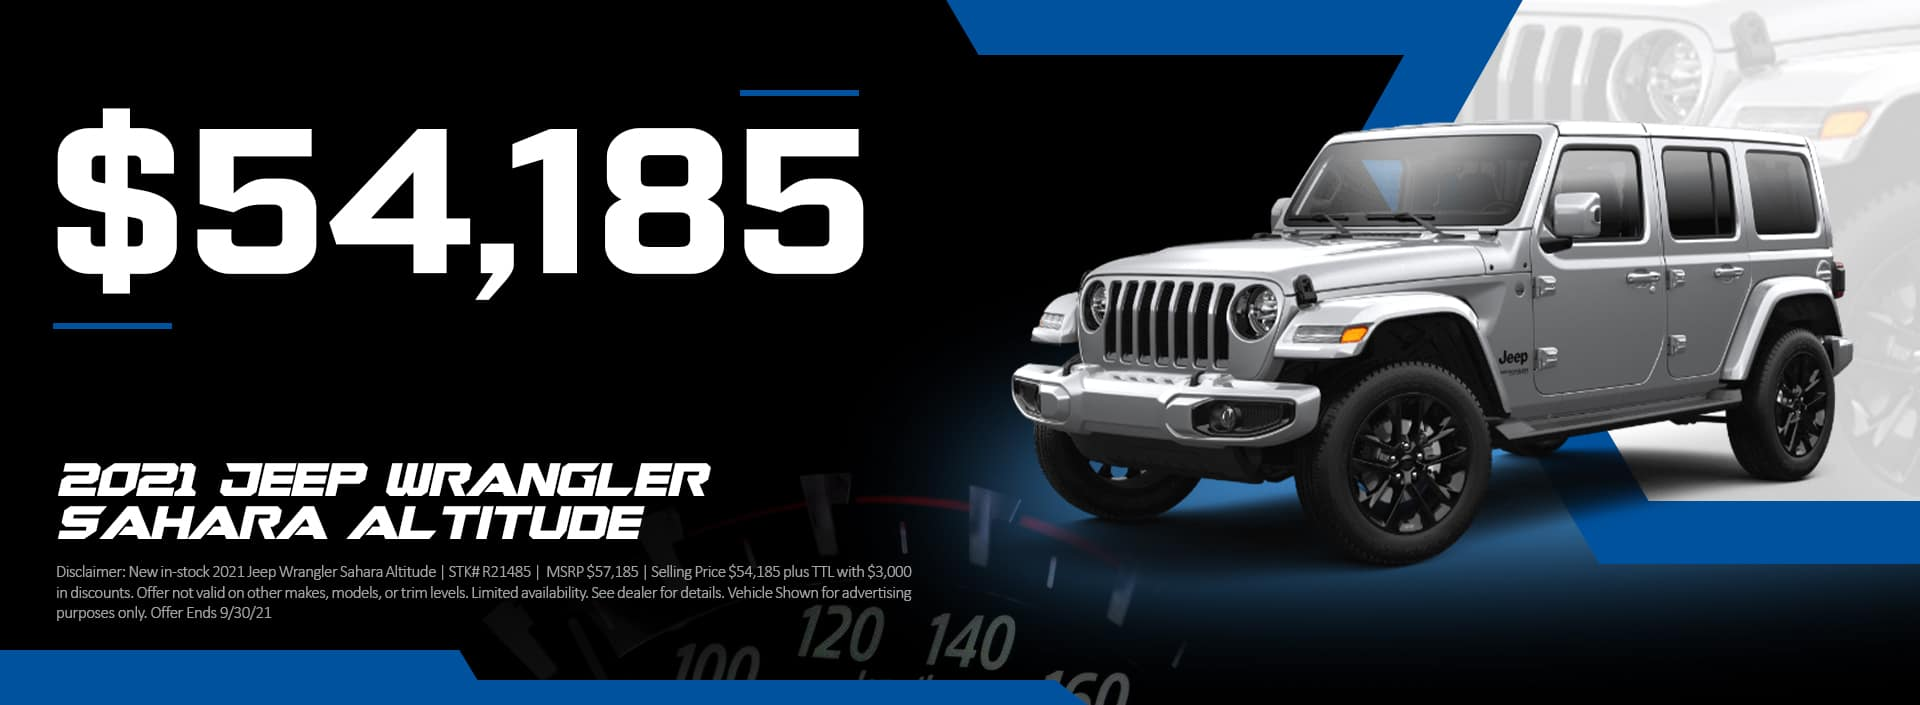 Winnie Dodge WEB Slider 9-21 – 4